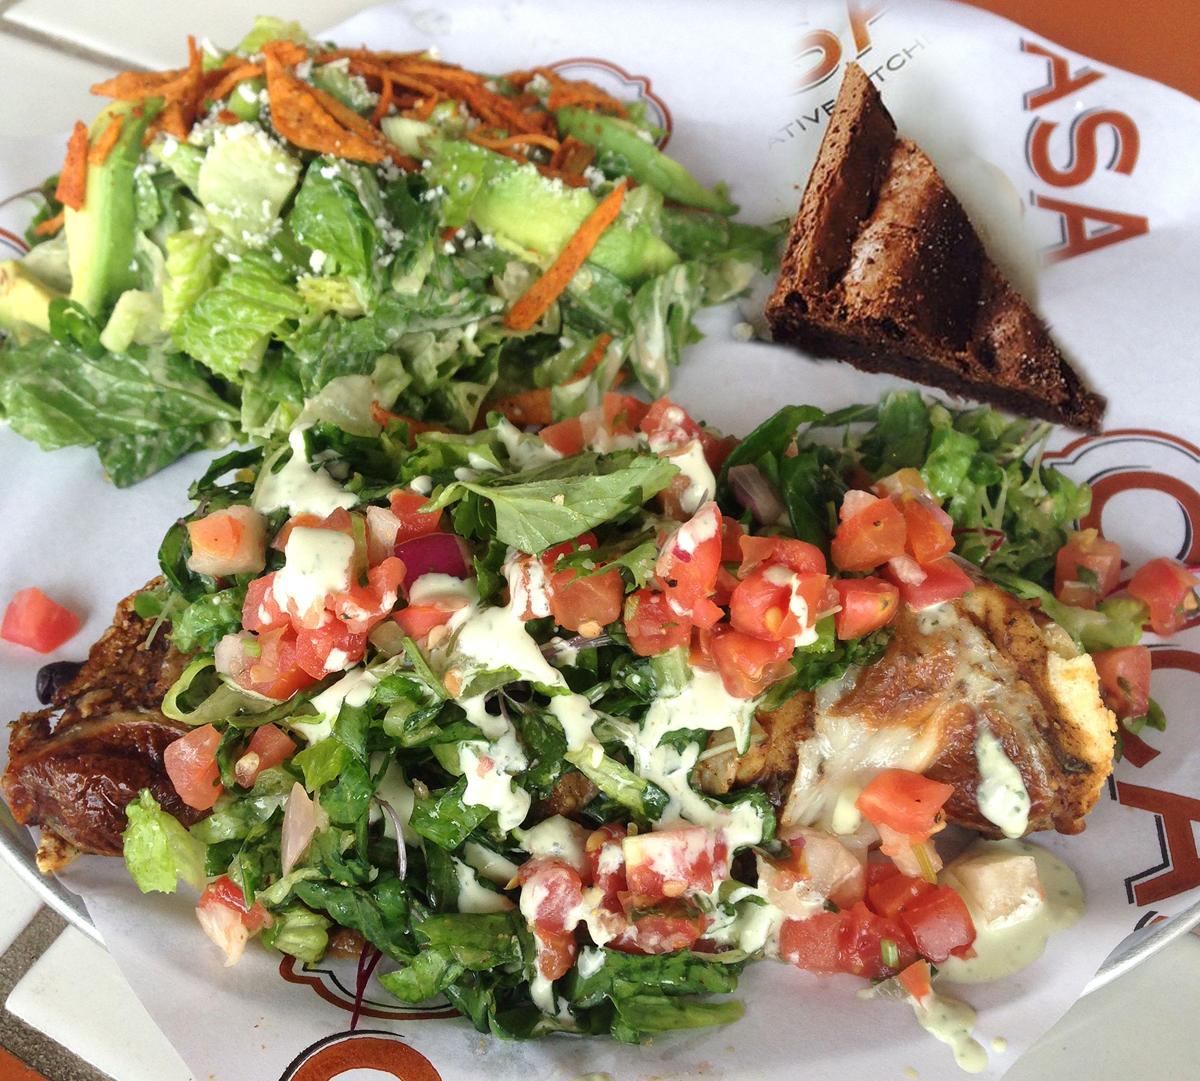 June enchilada plate special